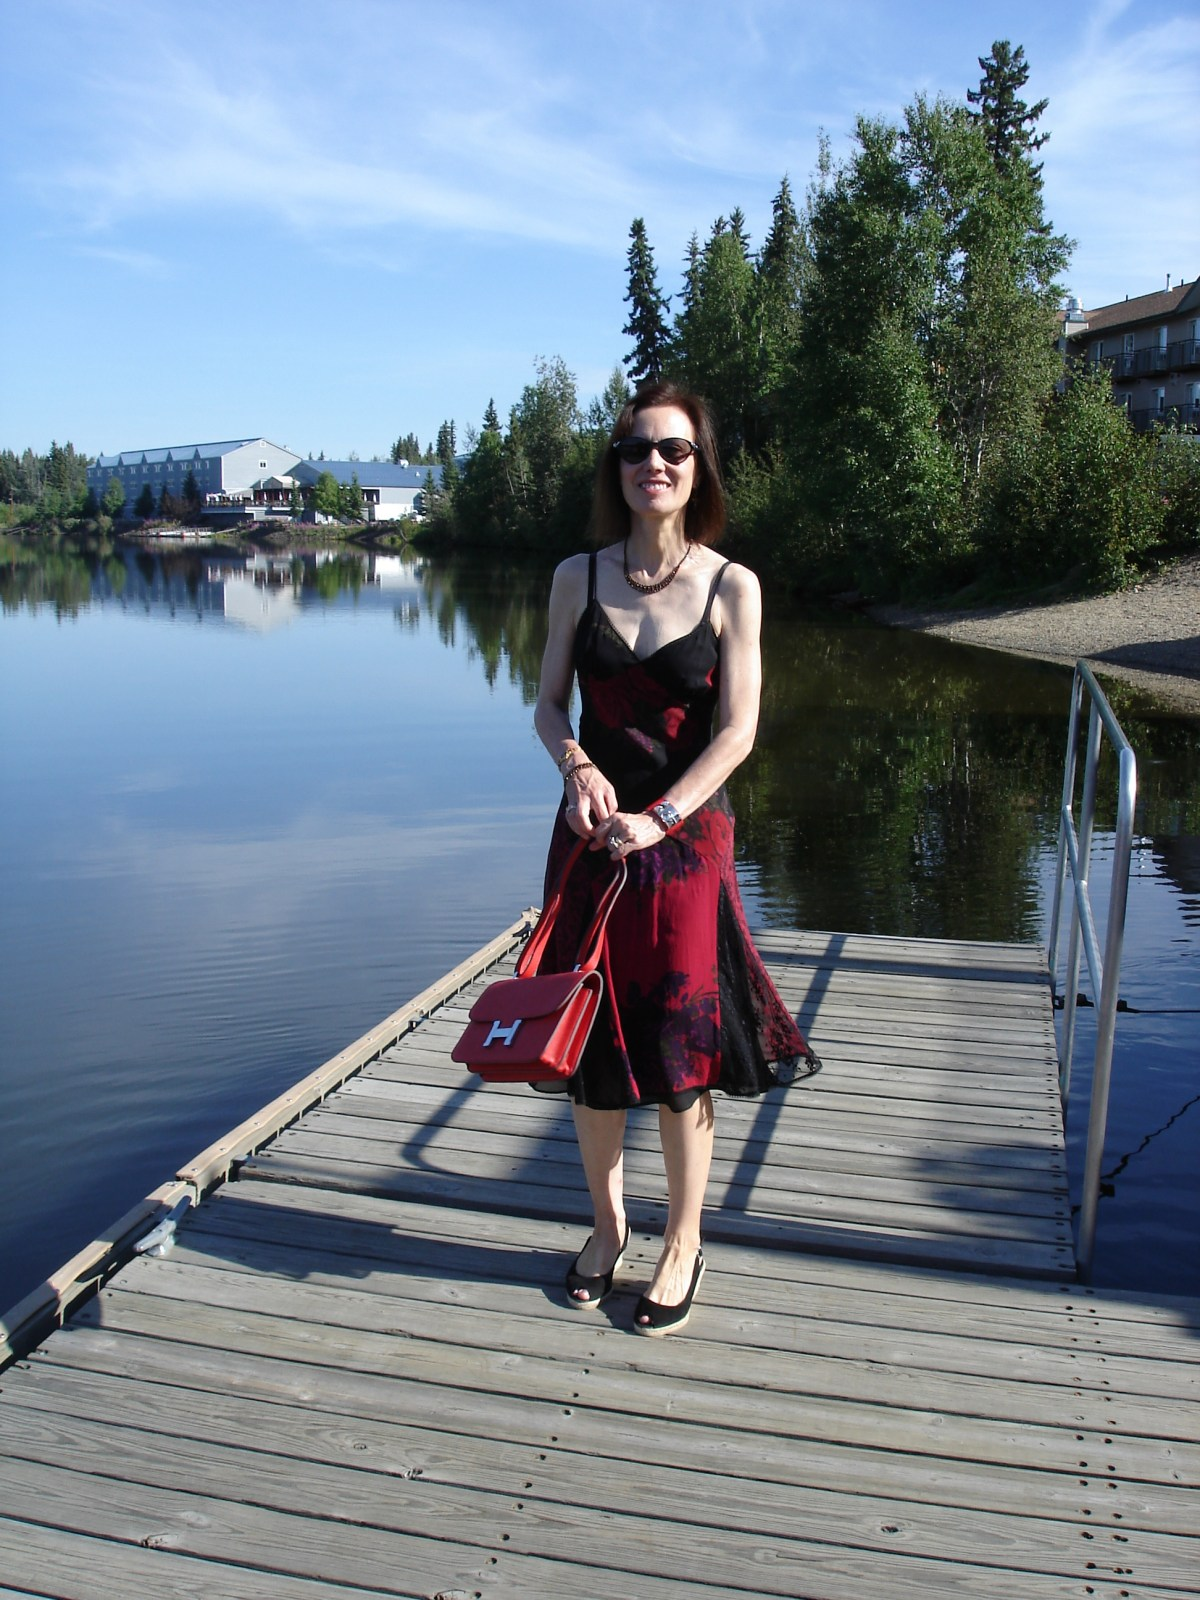 mature style blogger donning a resort sundress